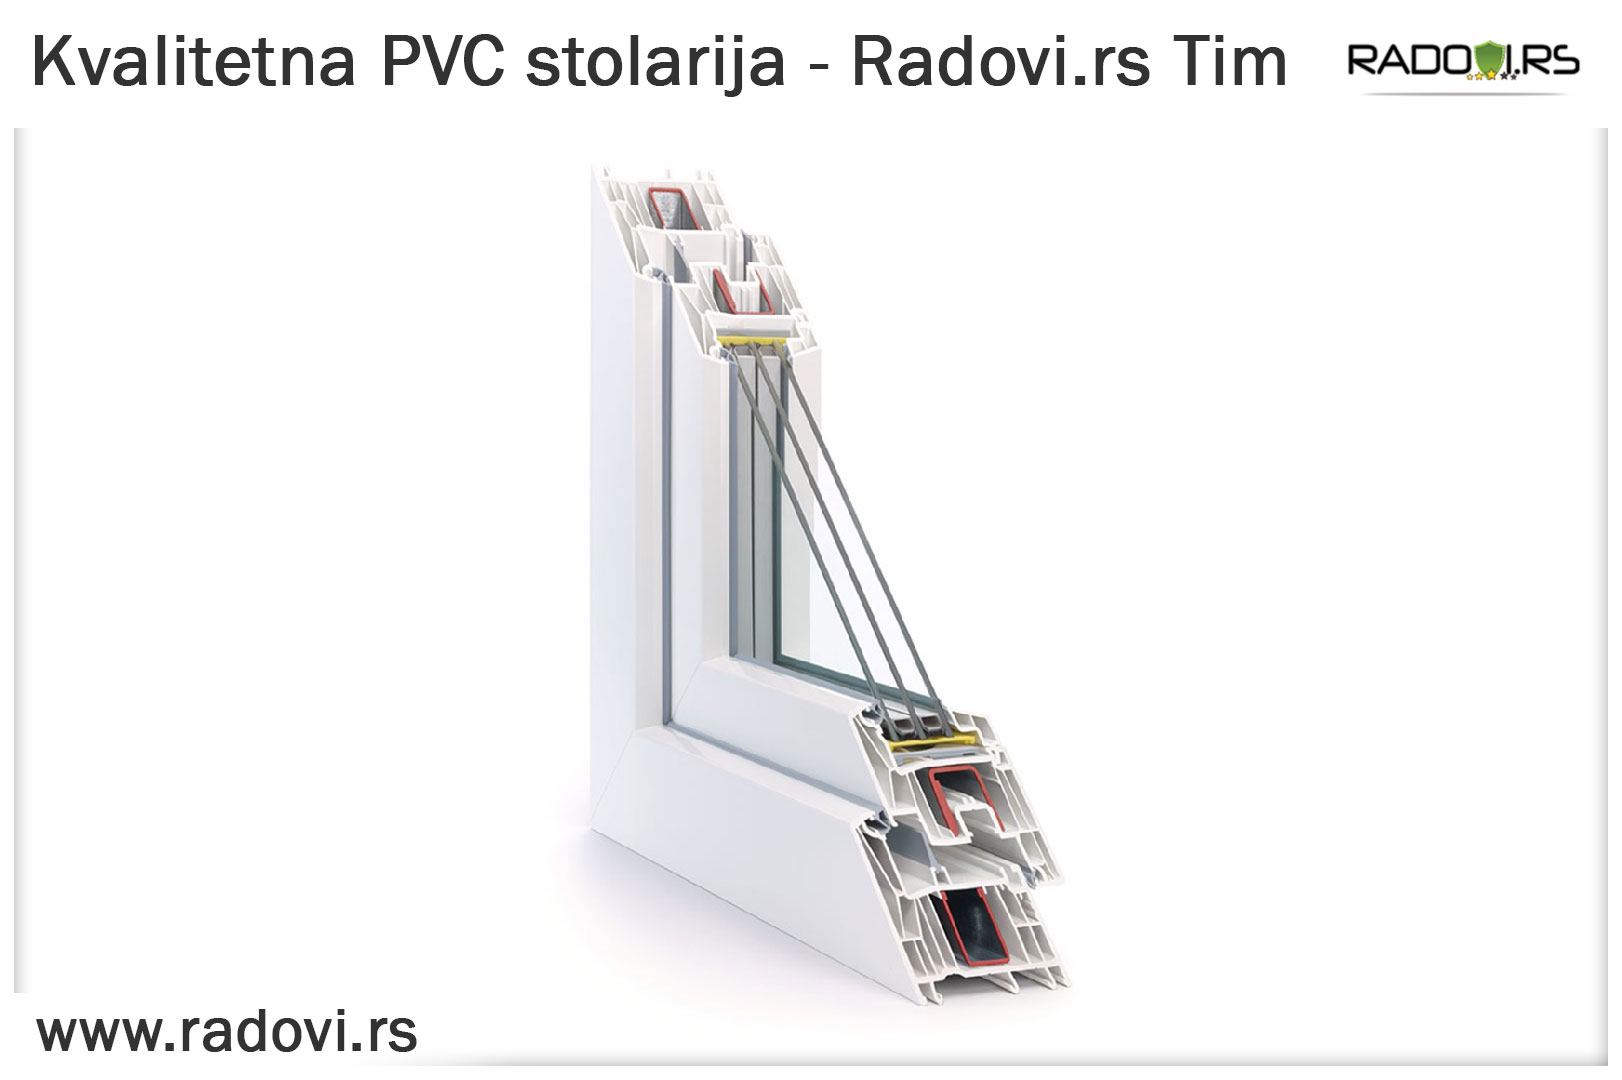 Kvalitetna PVC stolarija - PVC stolarija Tim - Radovi.rs